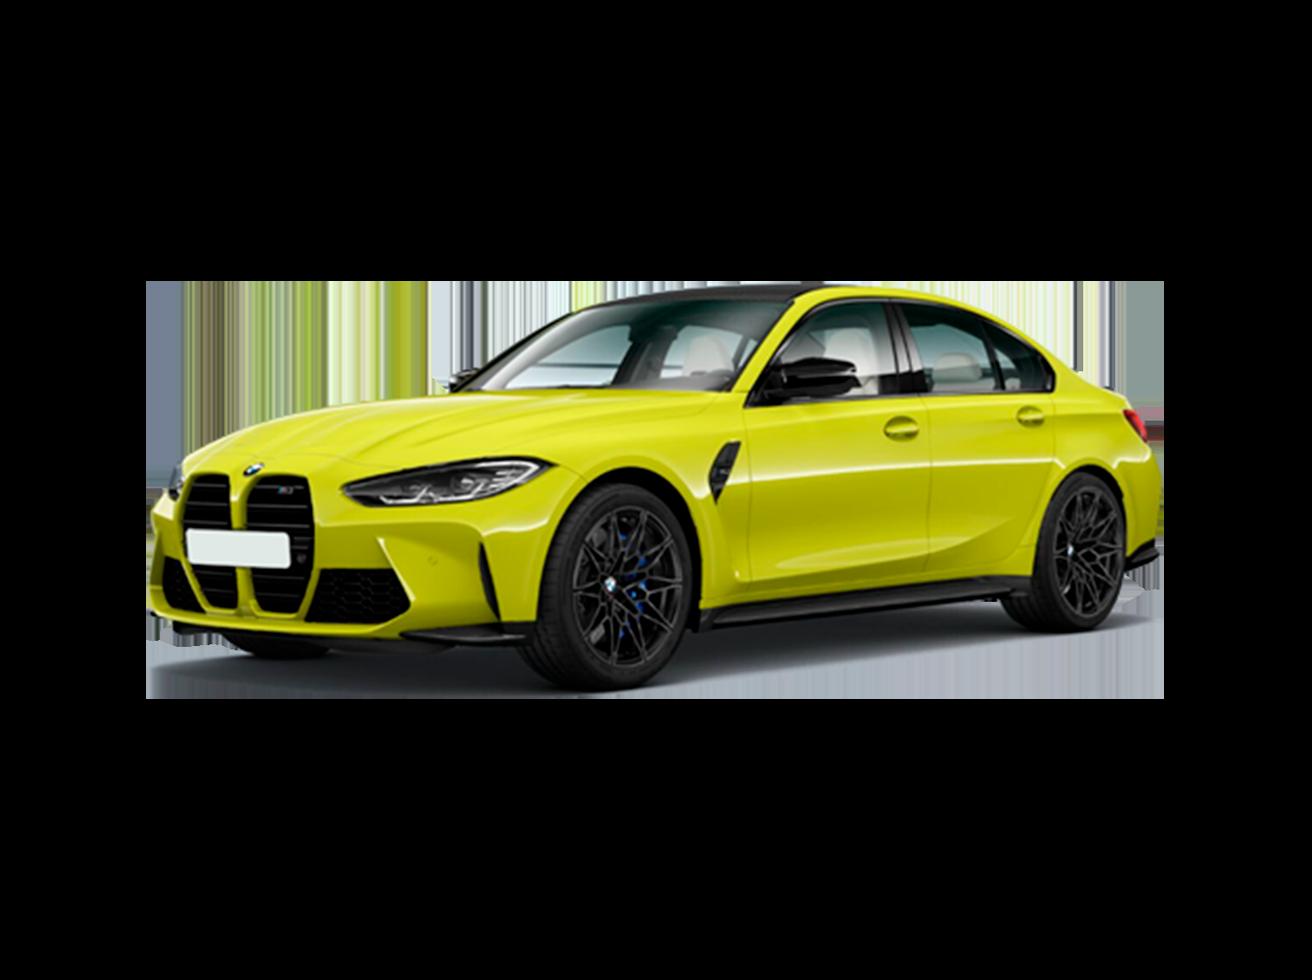 BMW - M3 - 3.0 I6 TWINTURBO GASOLINA COMPETITION M STEPTRONIC